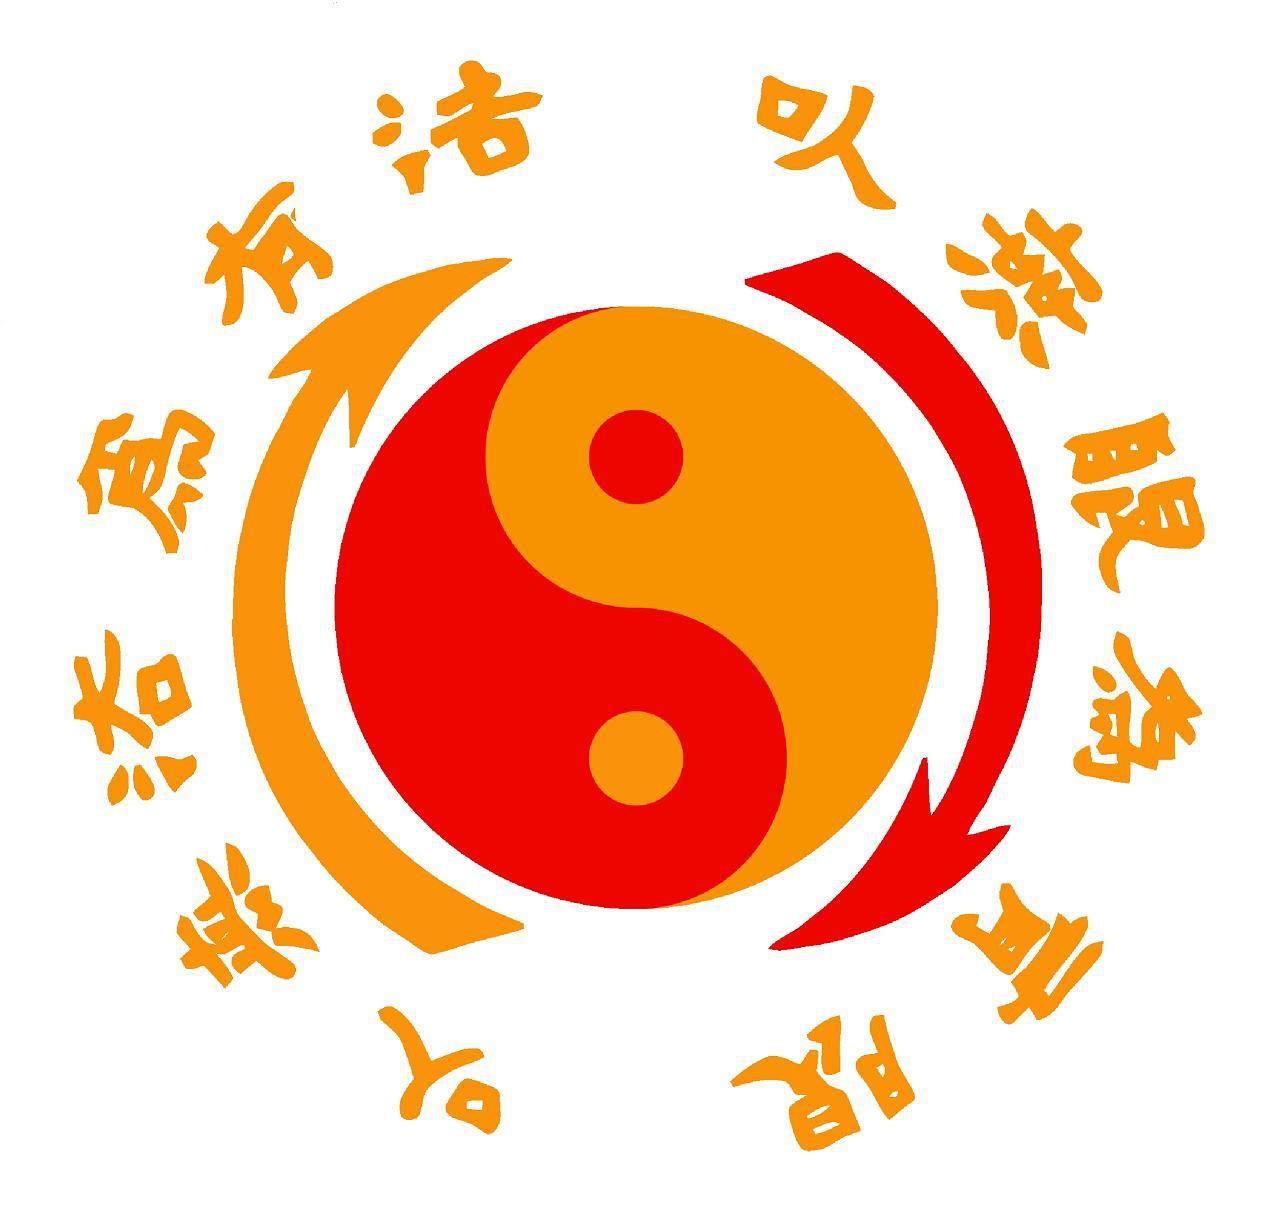 6.5) Bruce Lee\'s Jeet Kune Do logo. The characters translate.